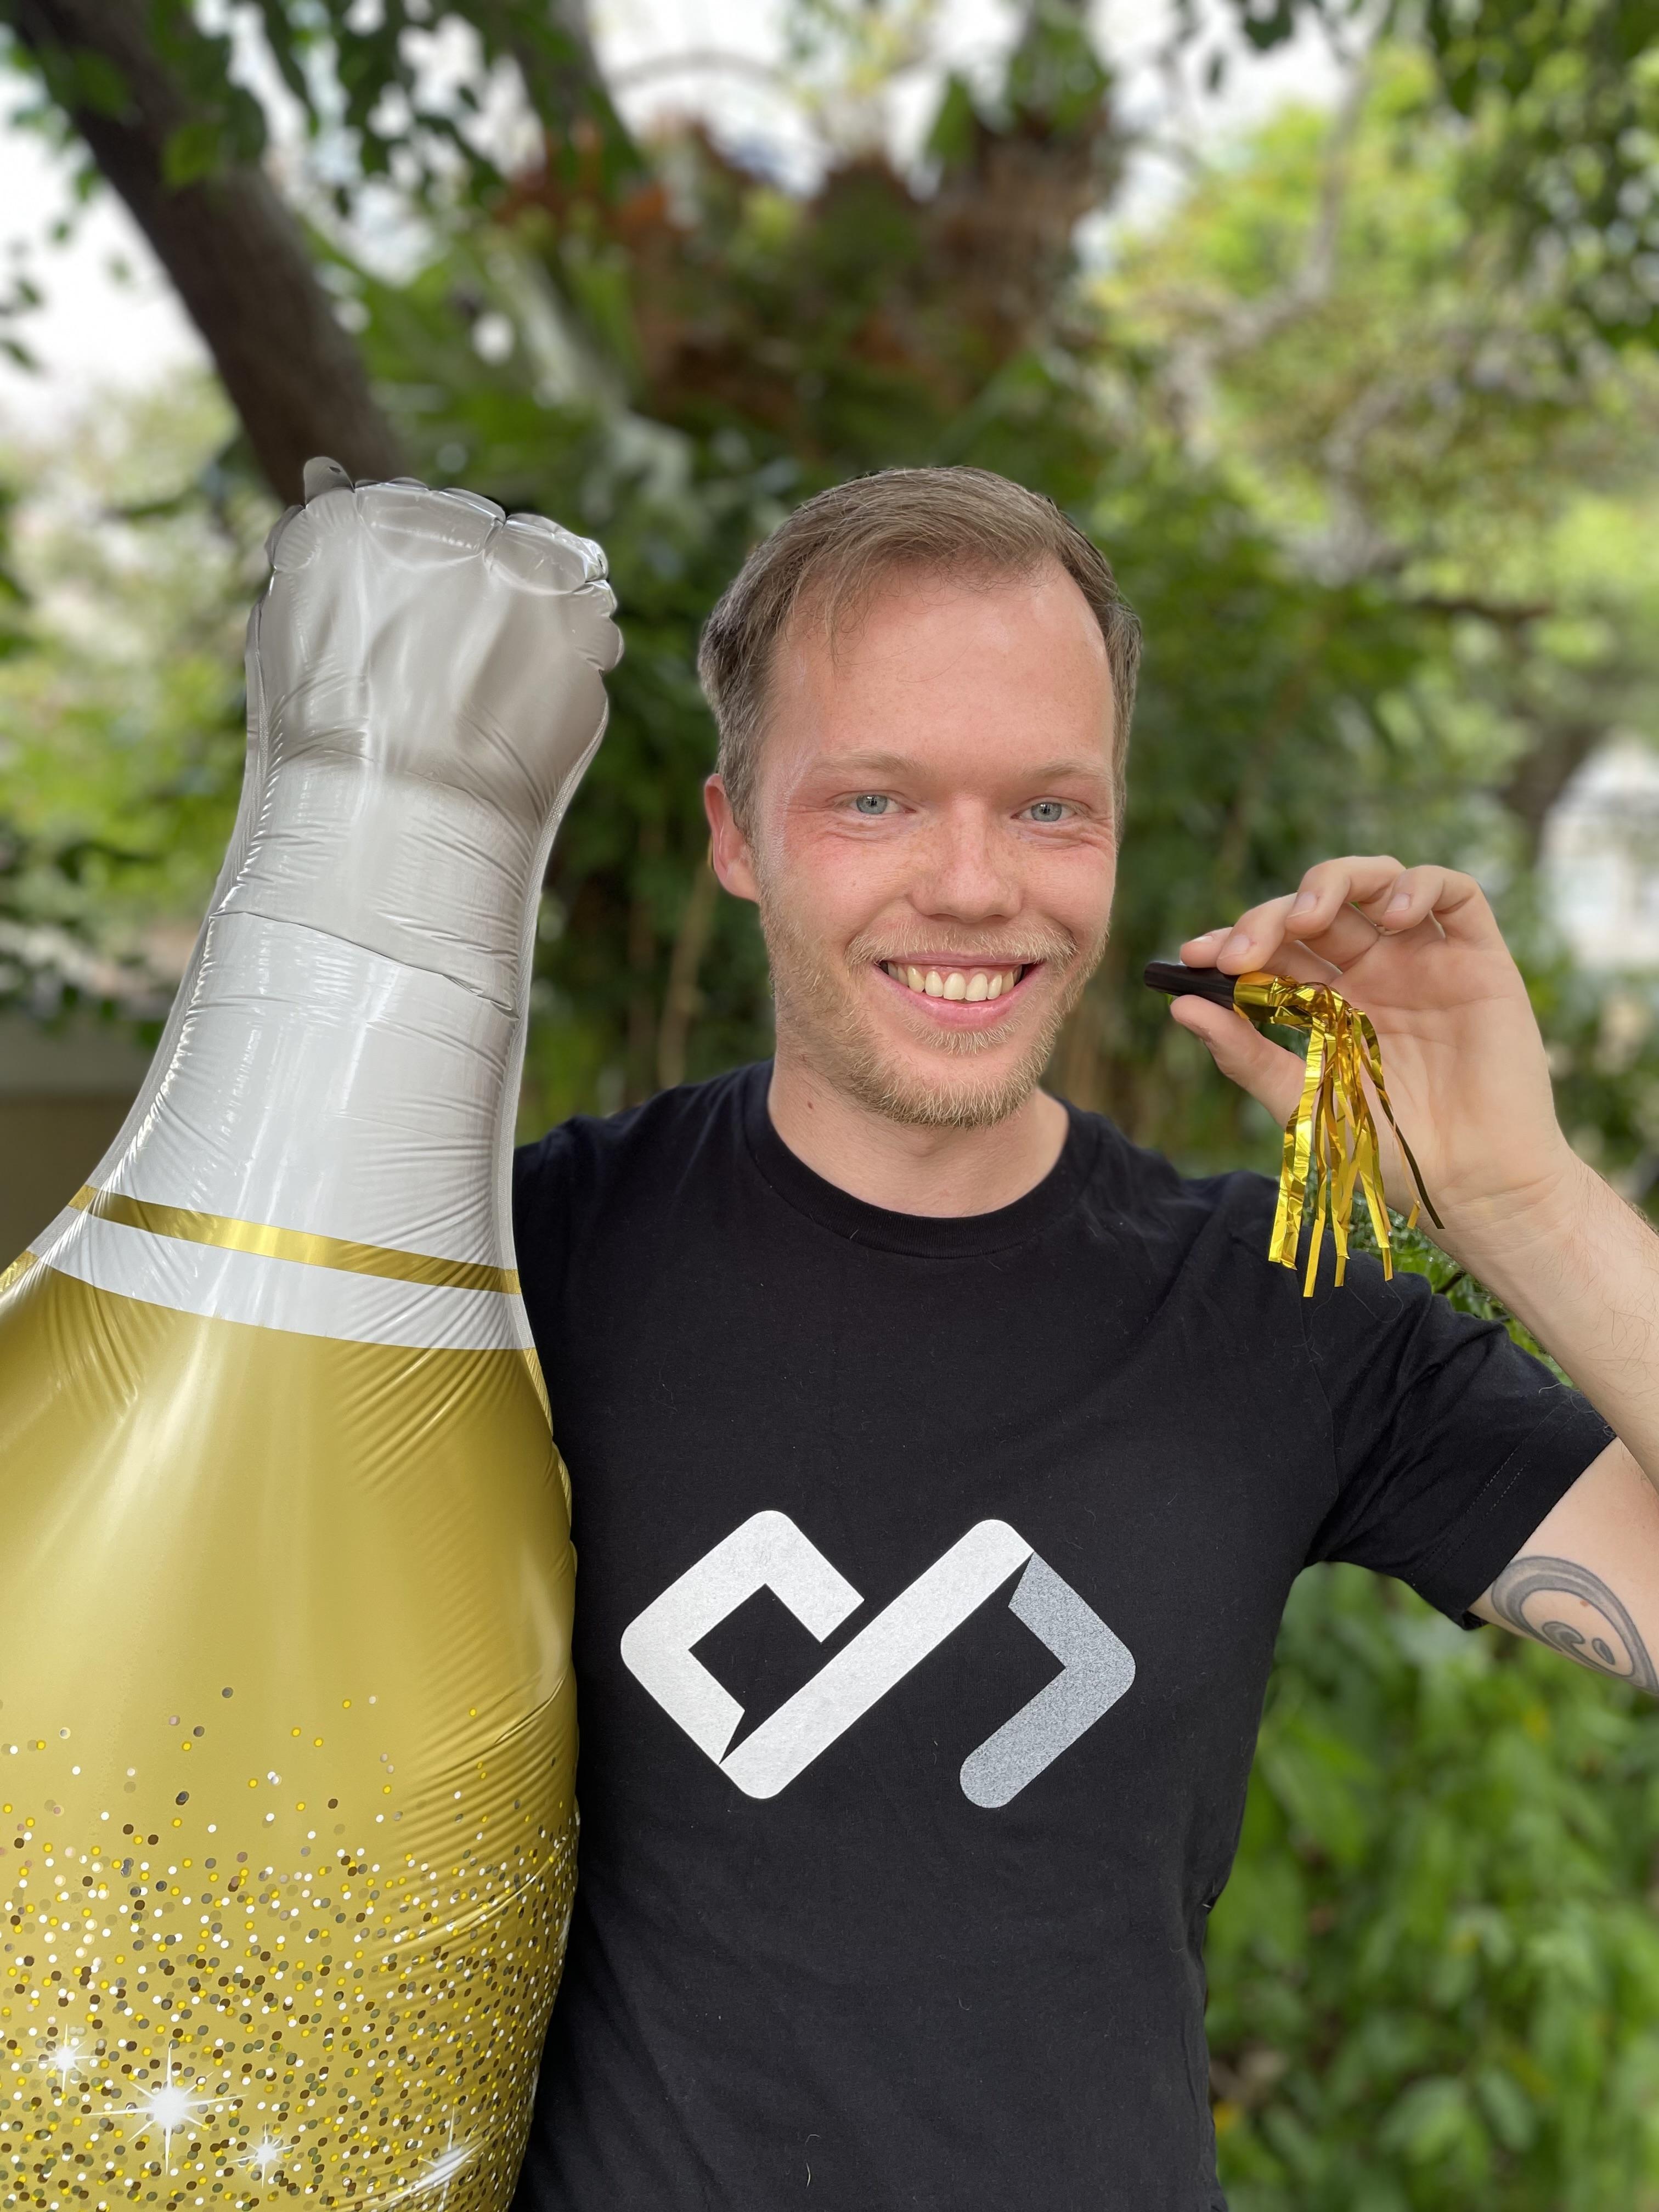 Chris celebrating new job